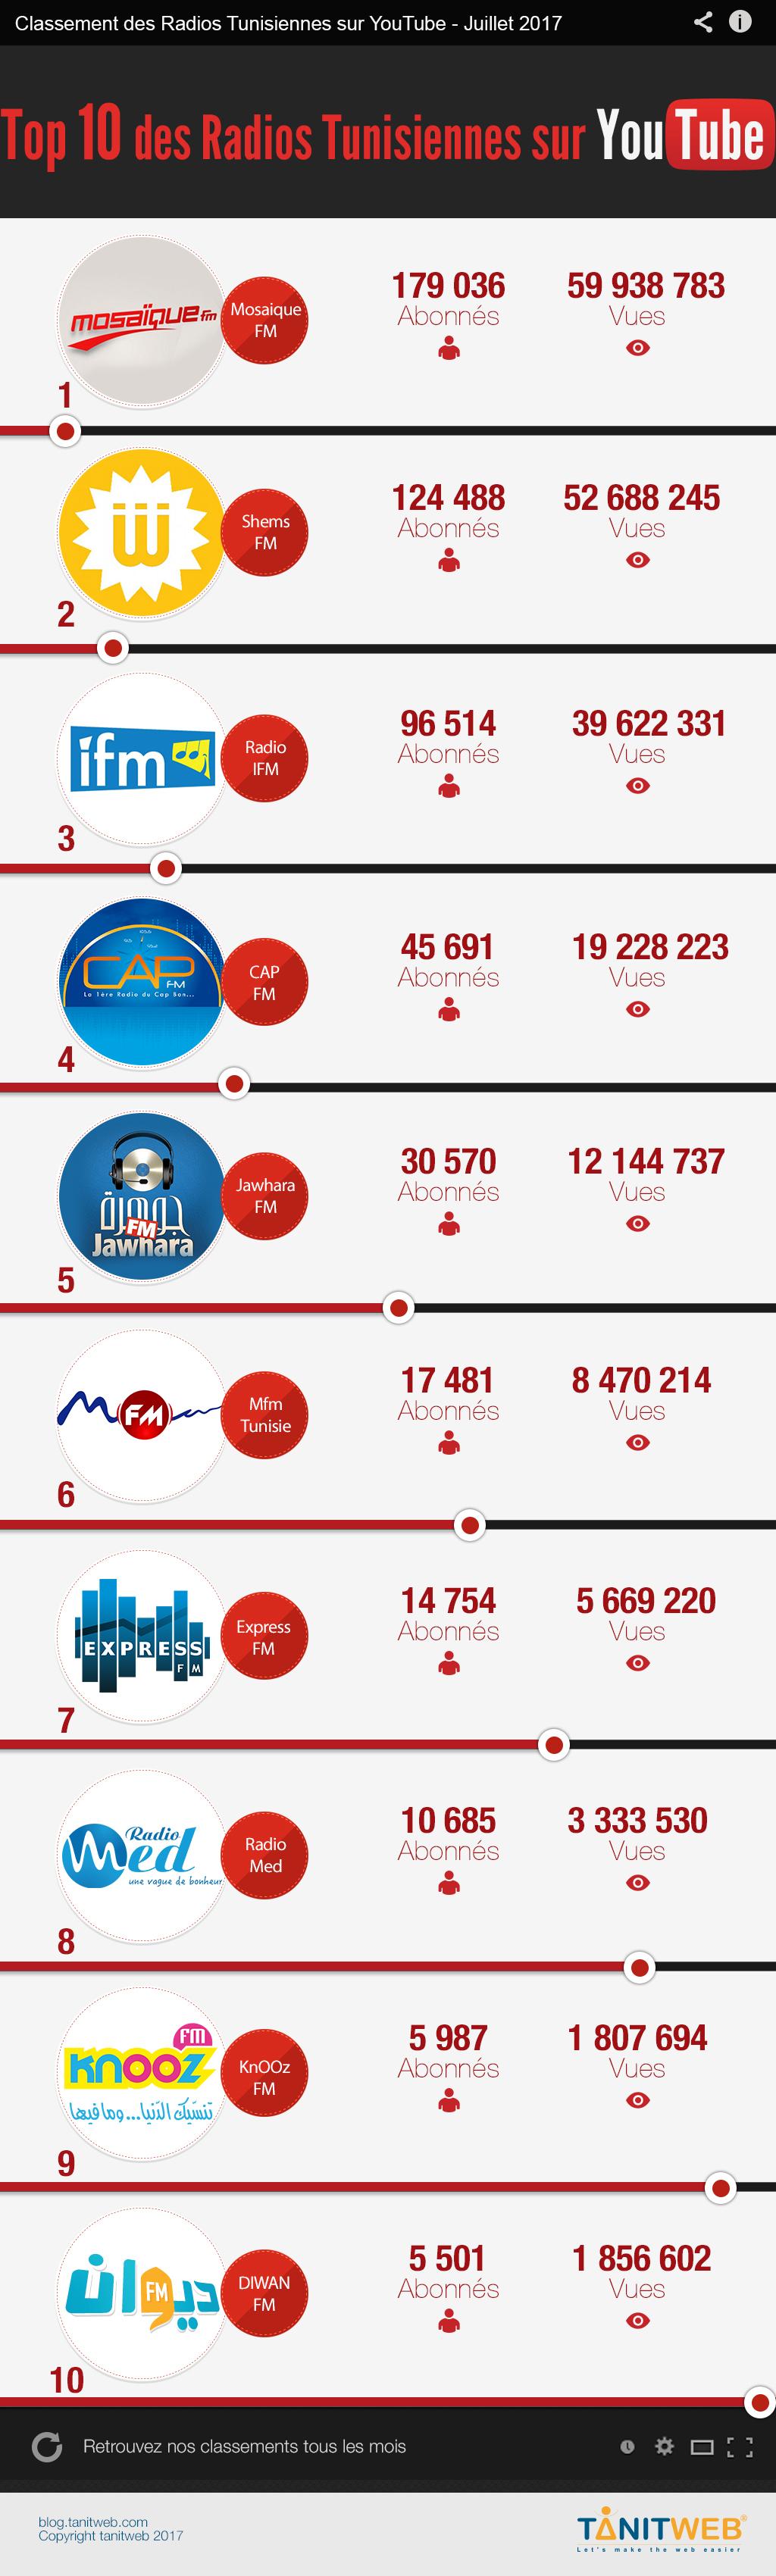 Juillet 2017 : TOP 10 Radios Tunisiennes sur YouTube